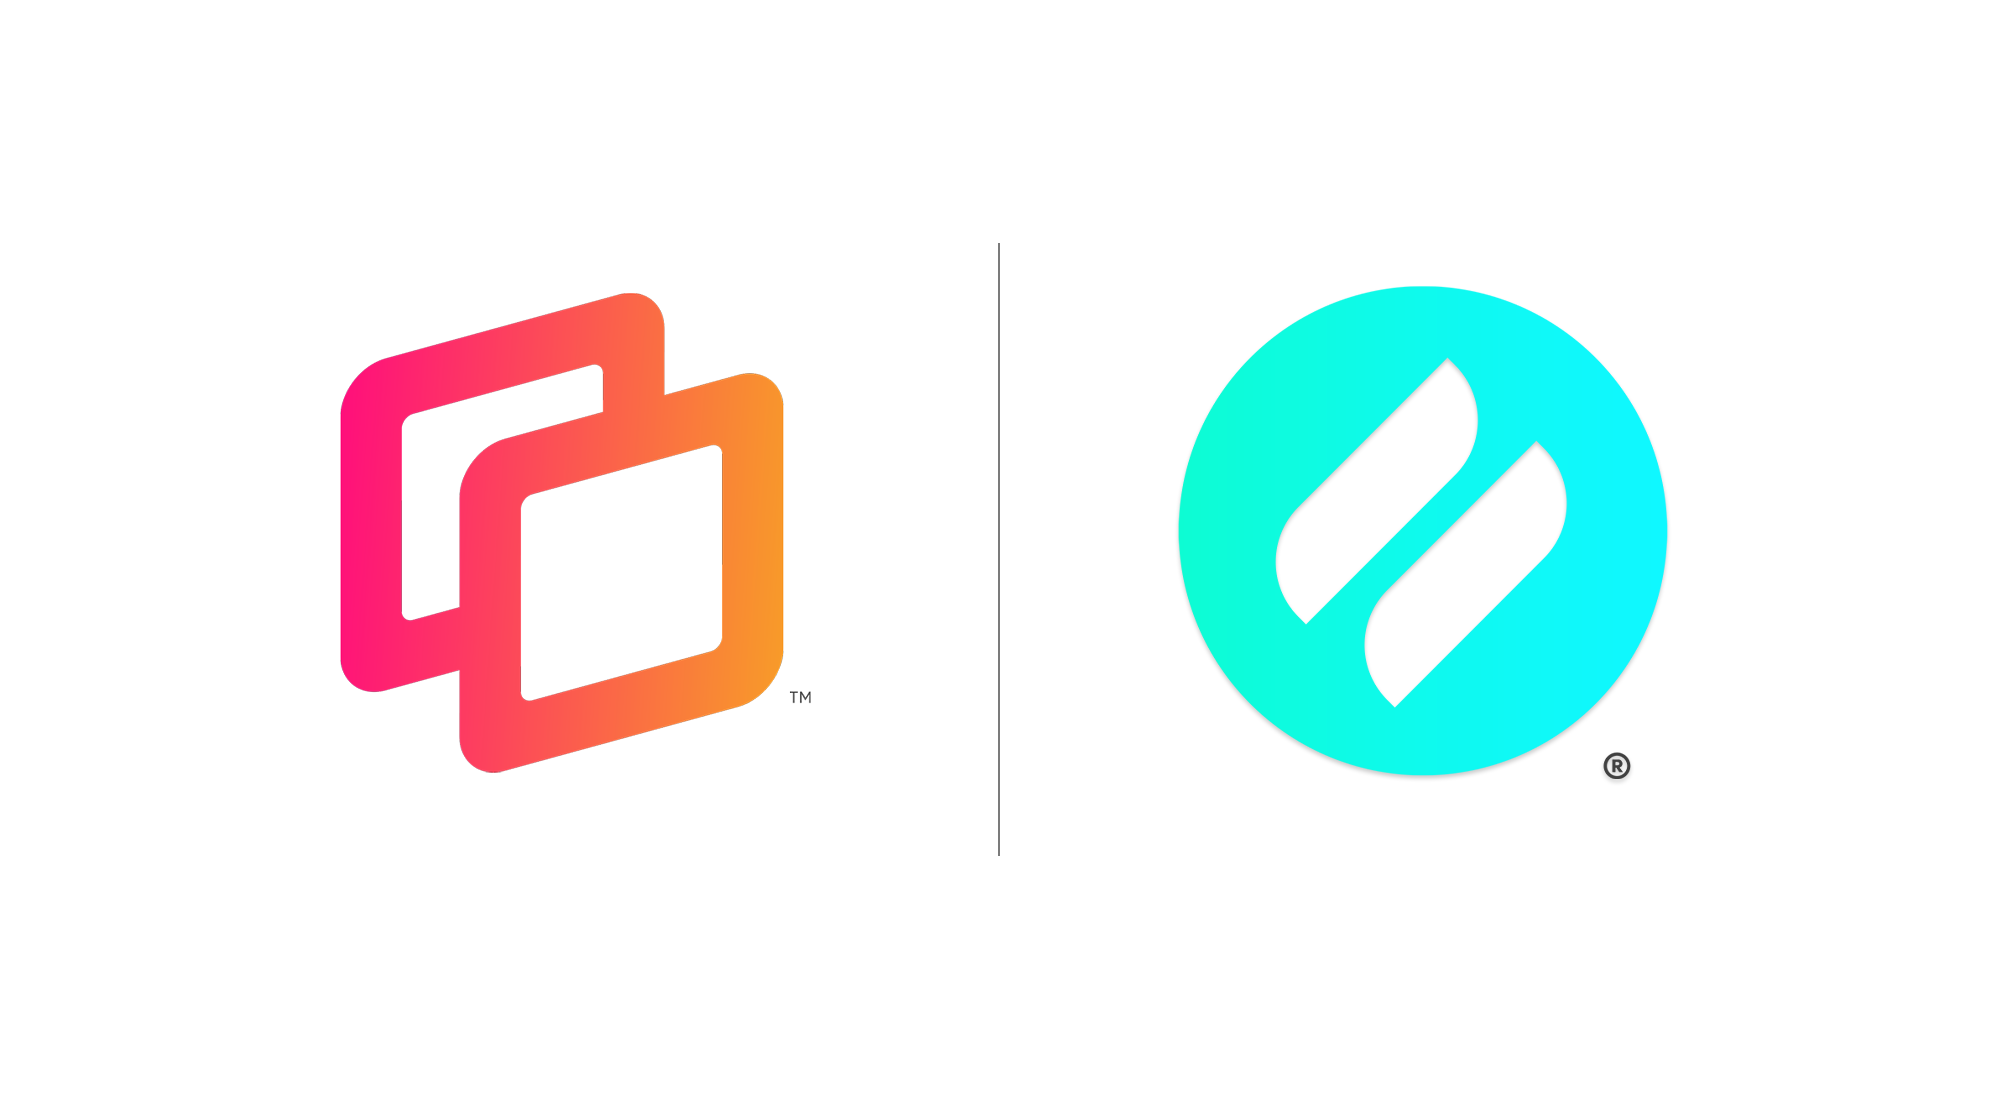 ditto logo and reflector logo